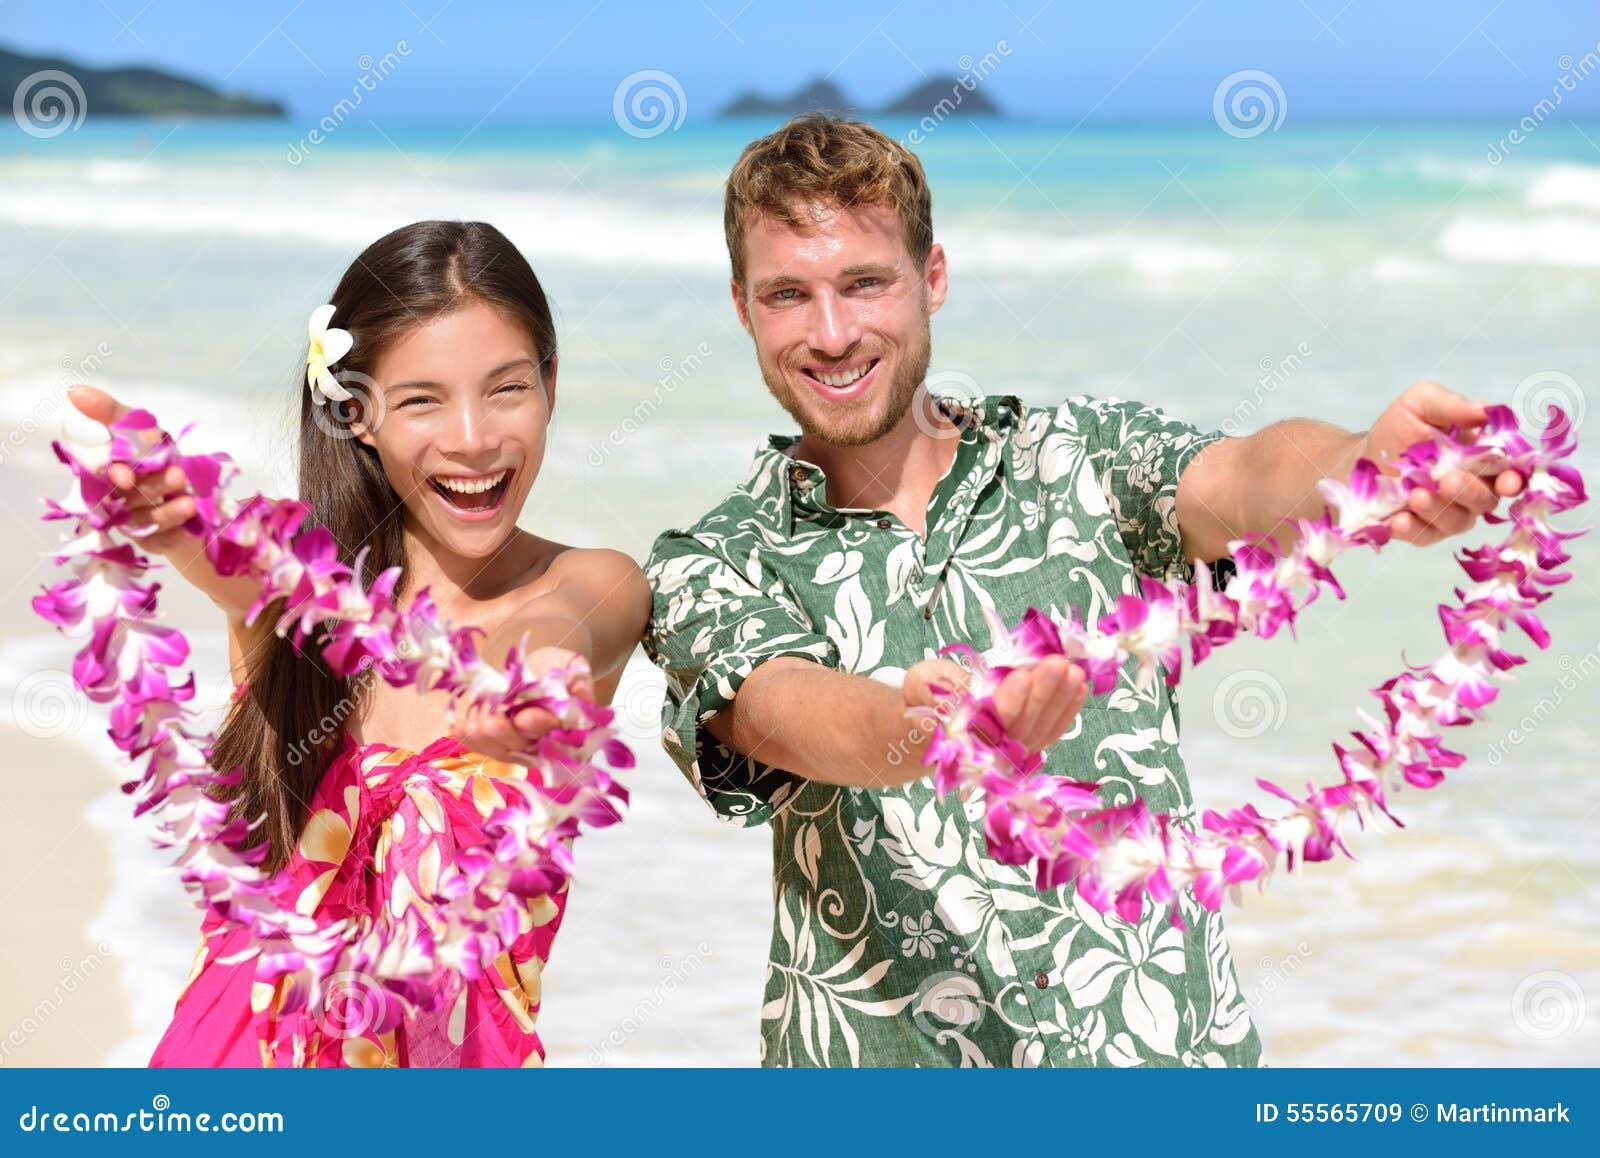 Welcome To Hawaii Hawaiian People Showing Lei Stock Image Image